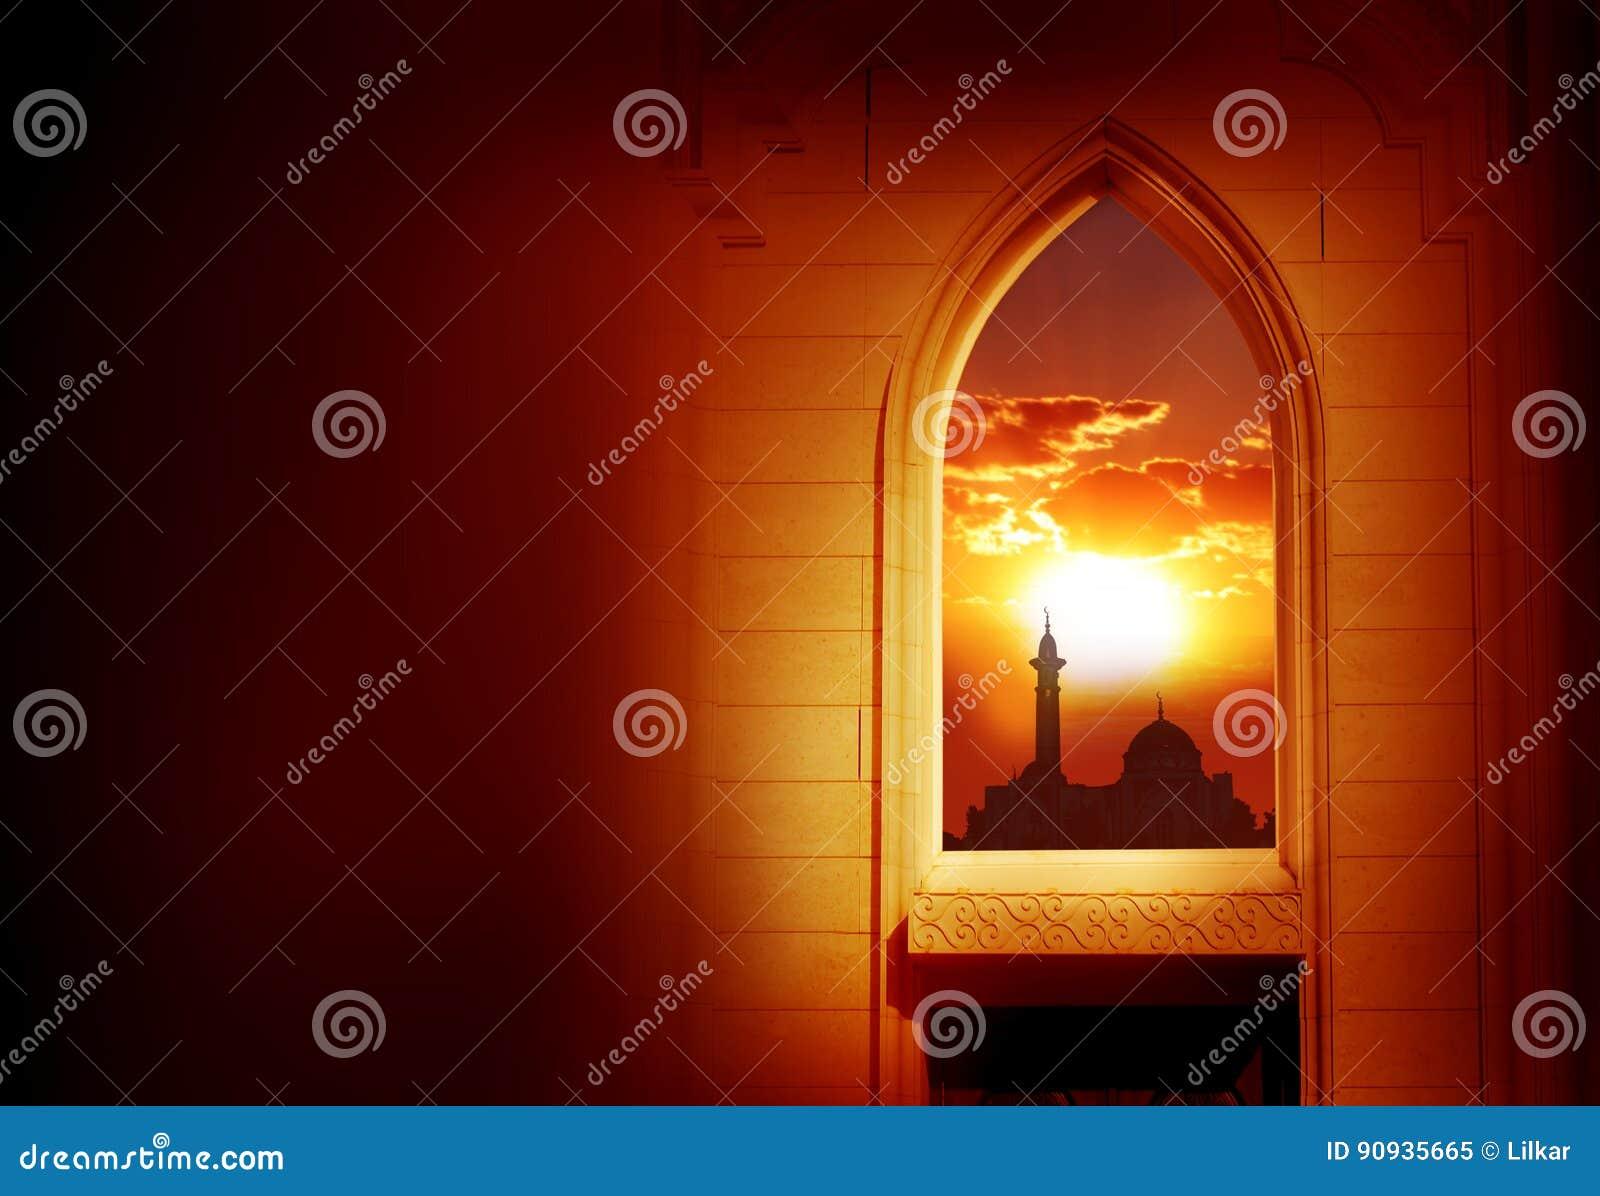 Mosque background for ramadan kareem stock photography image - Royalty Free Stock Photo Background Kareem Ramadan